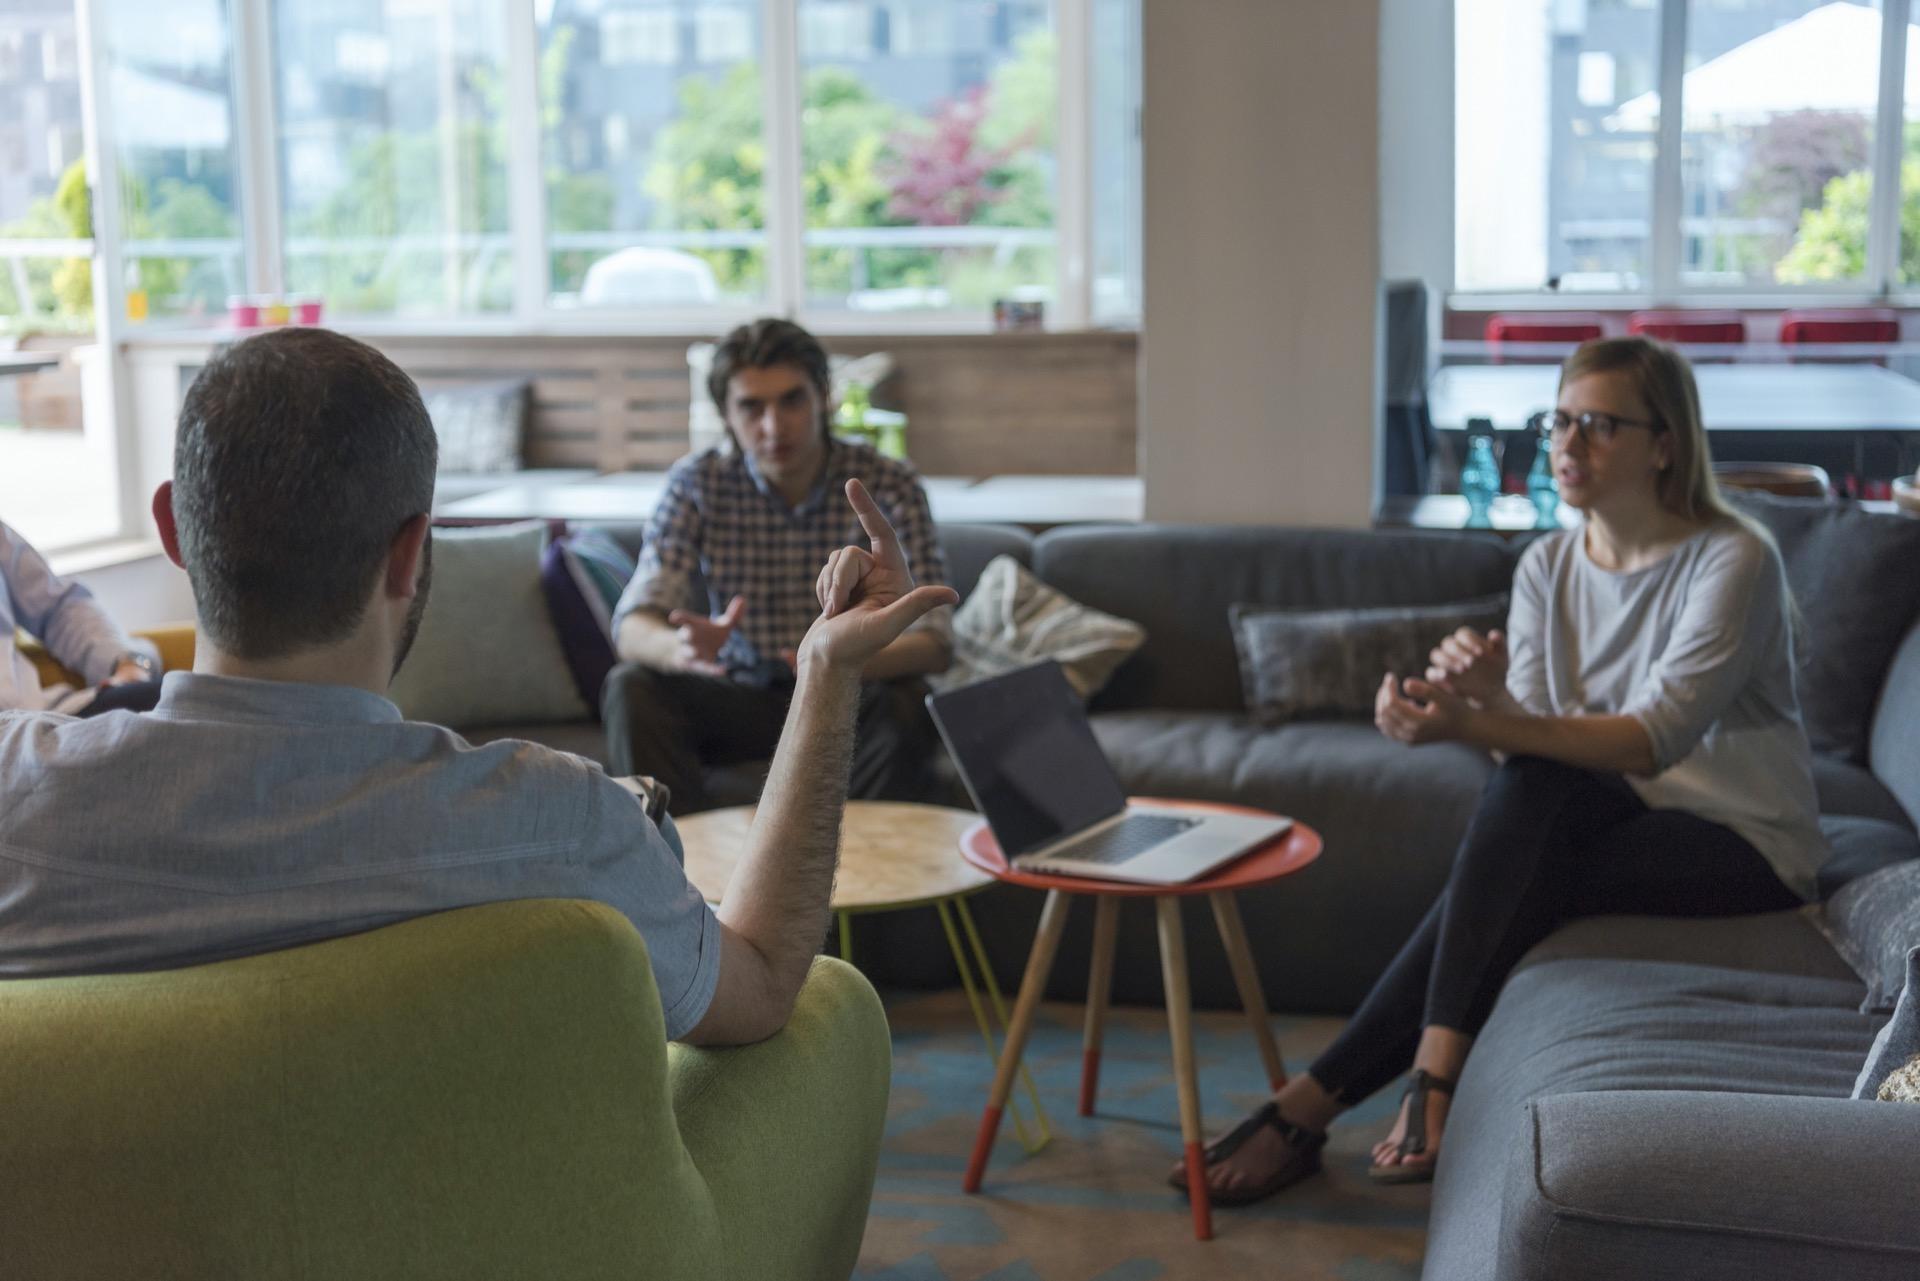 team-meeting-and-brainstorming-P6Y9QVJ